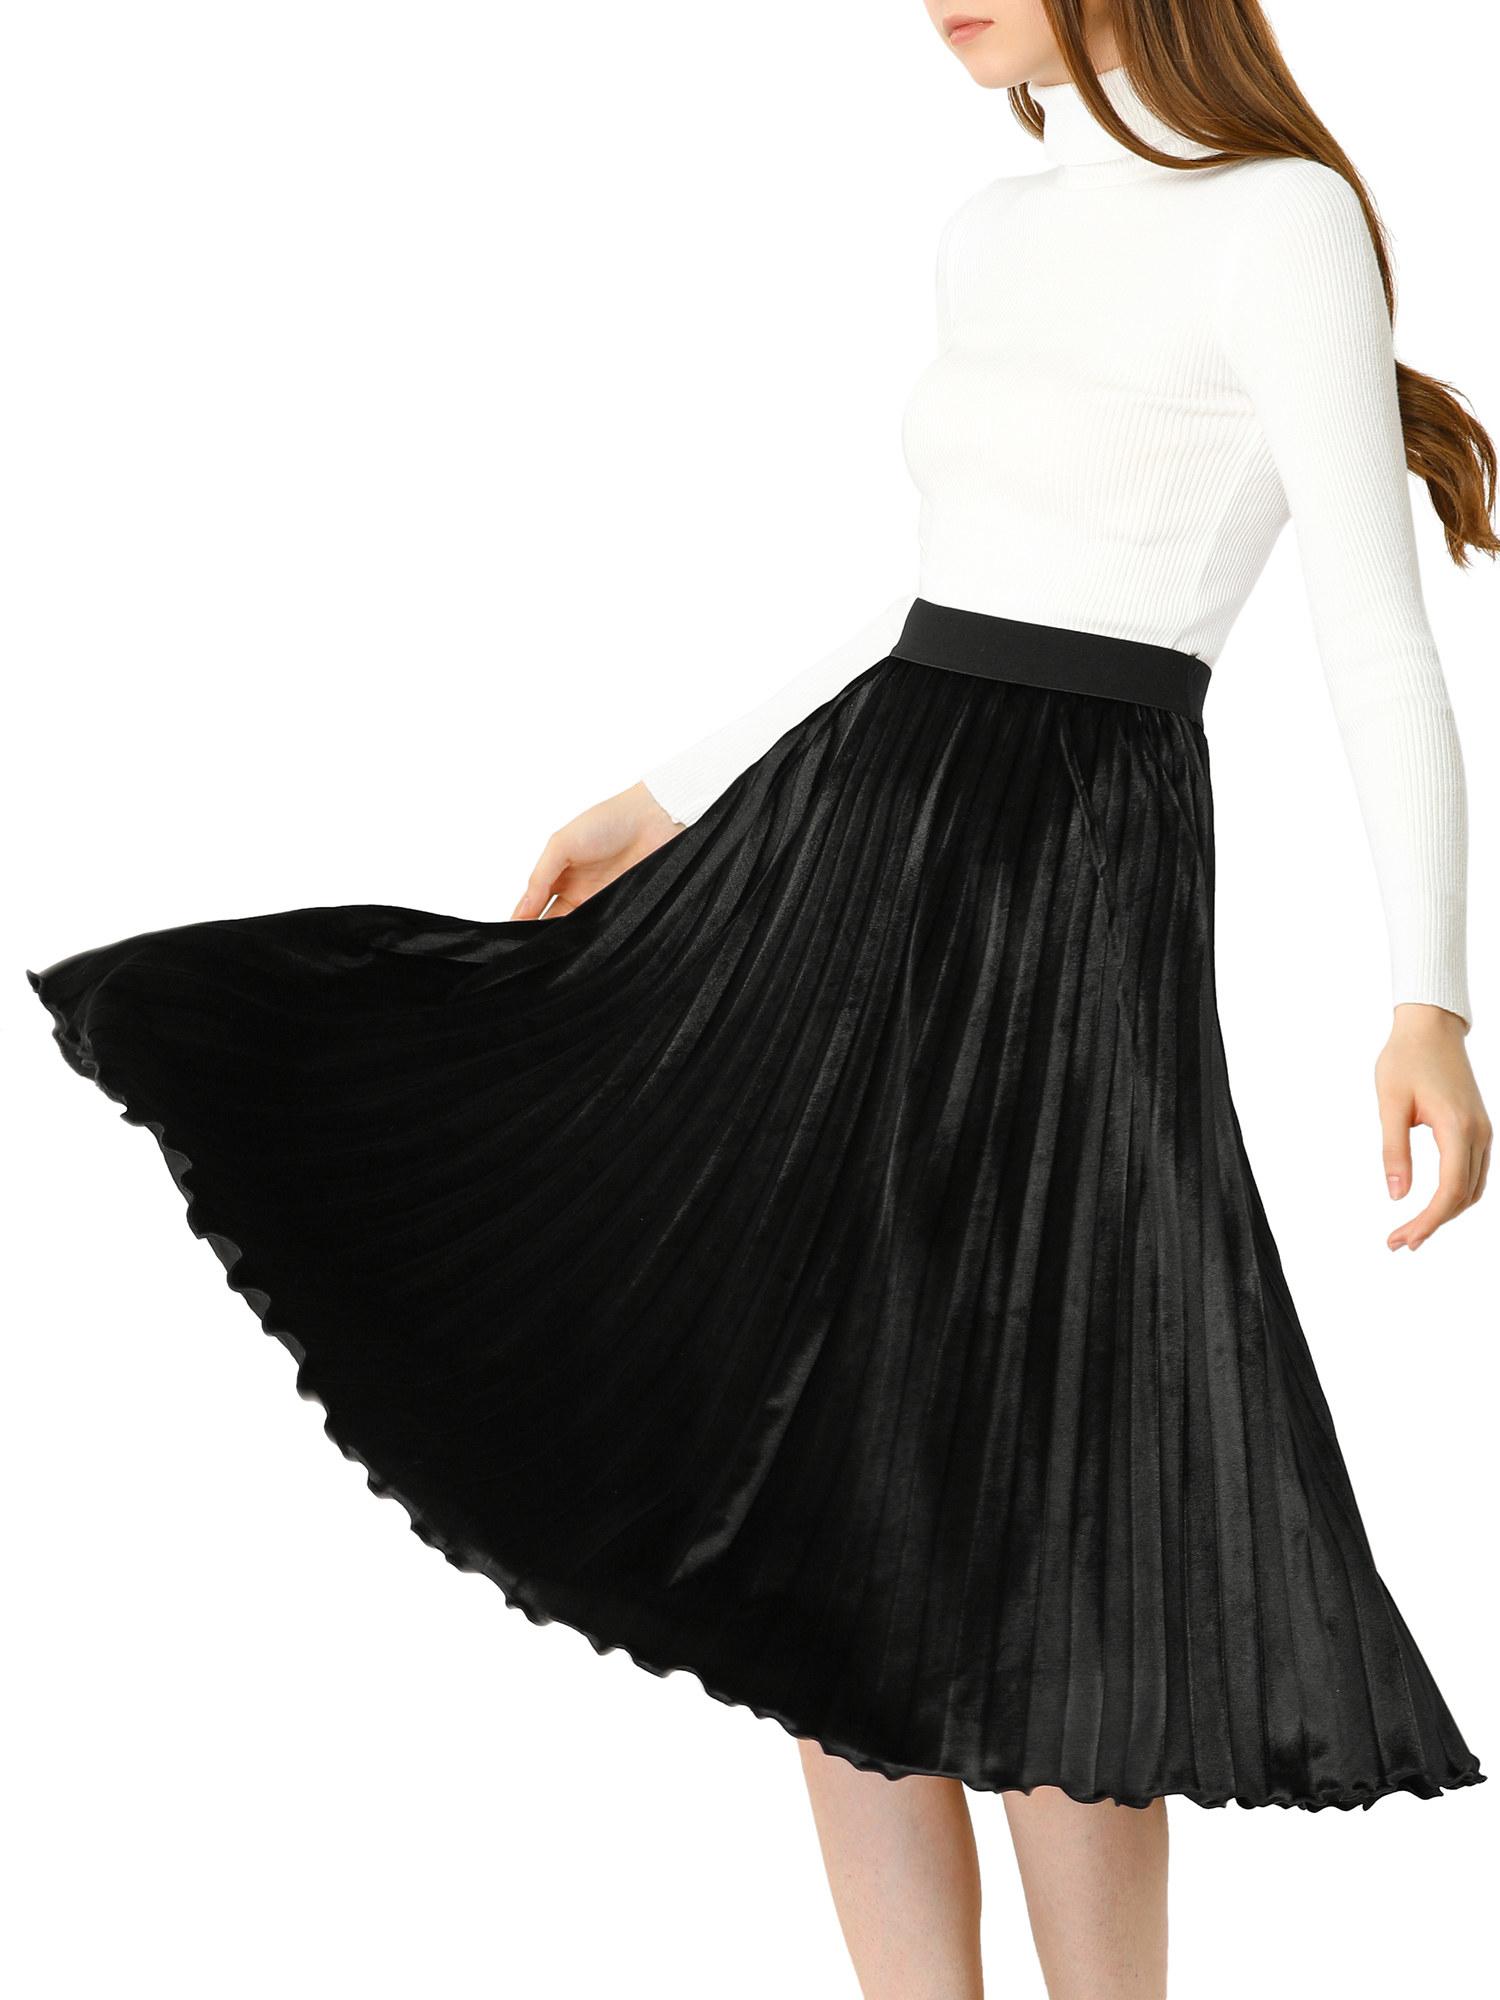 Model wearing pleated black skirt